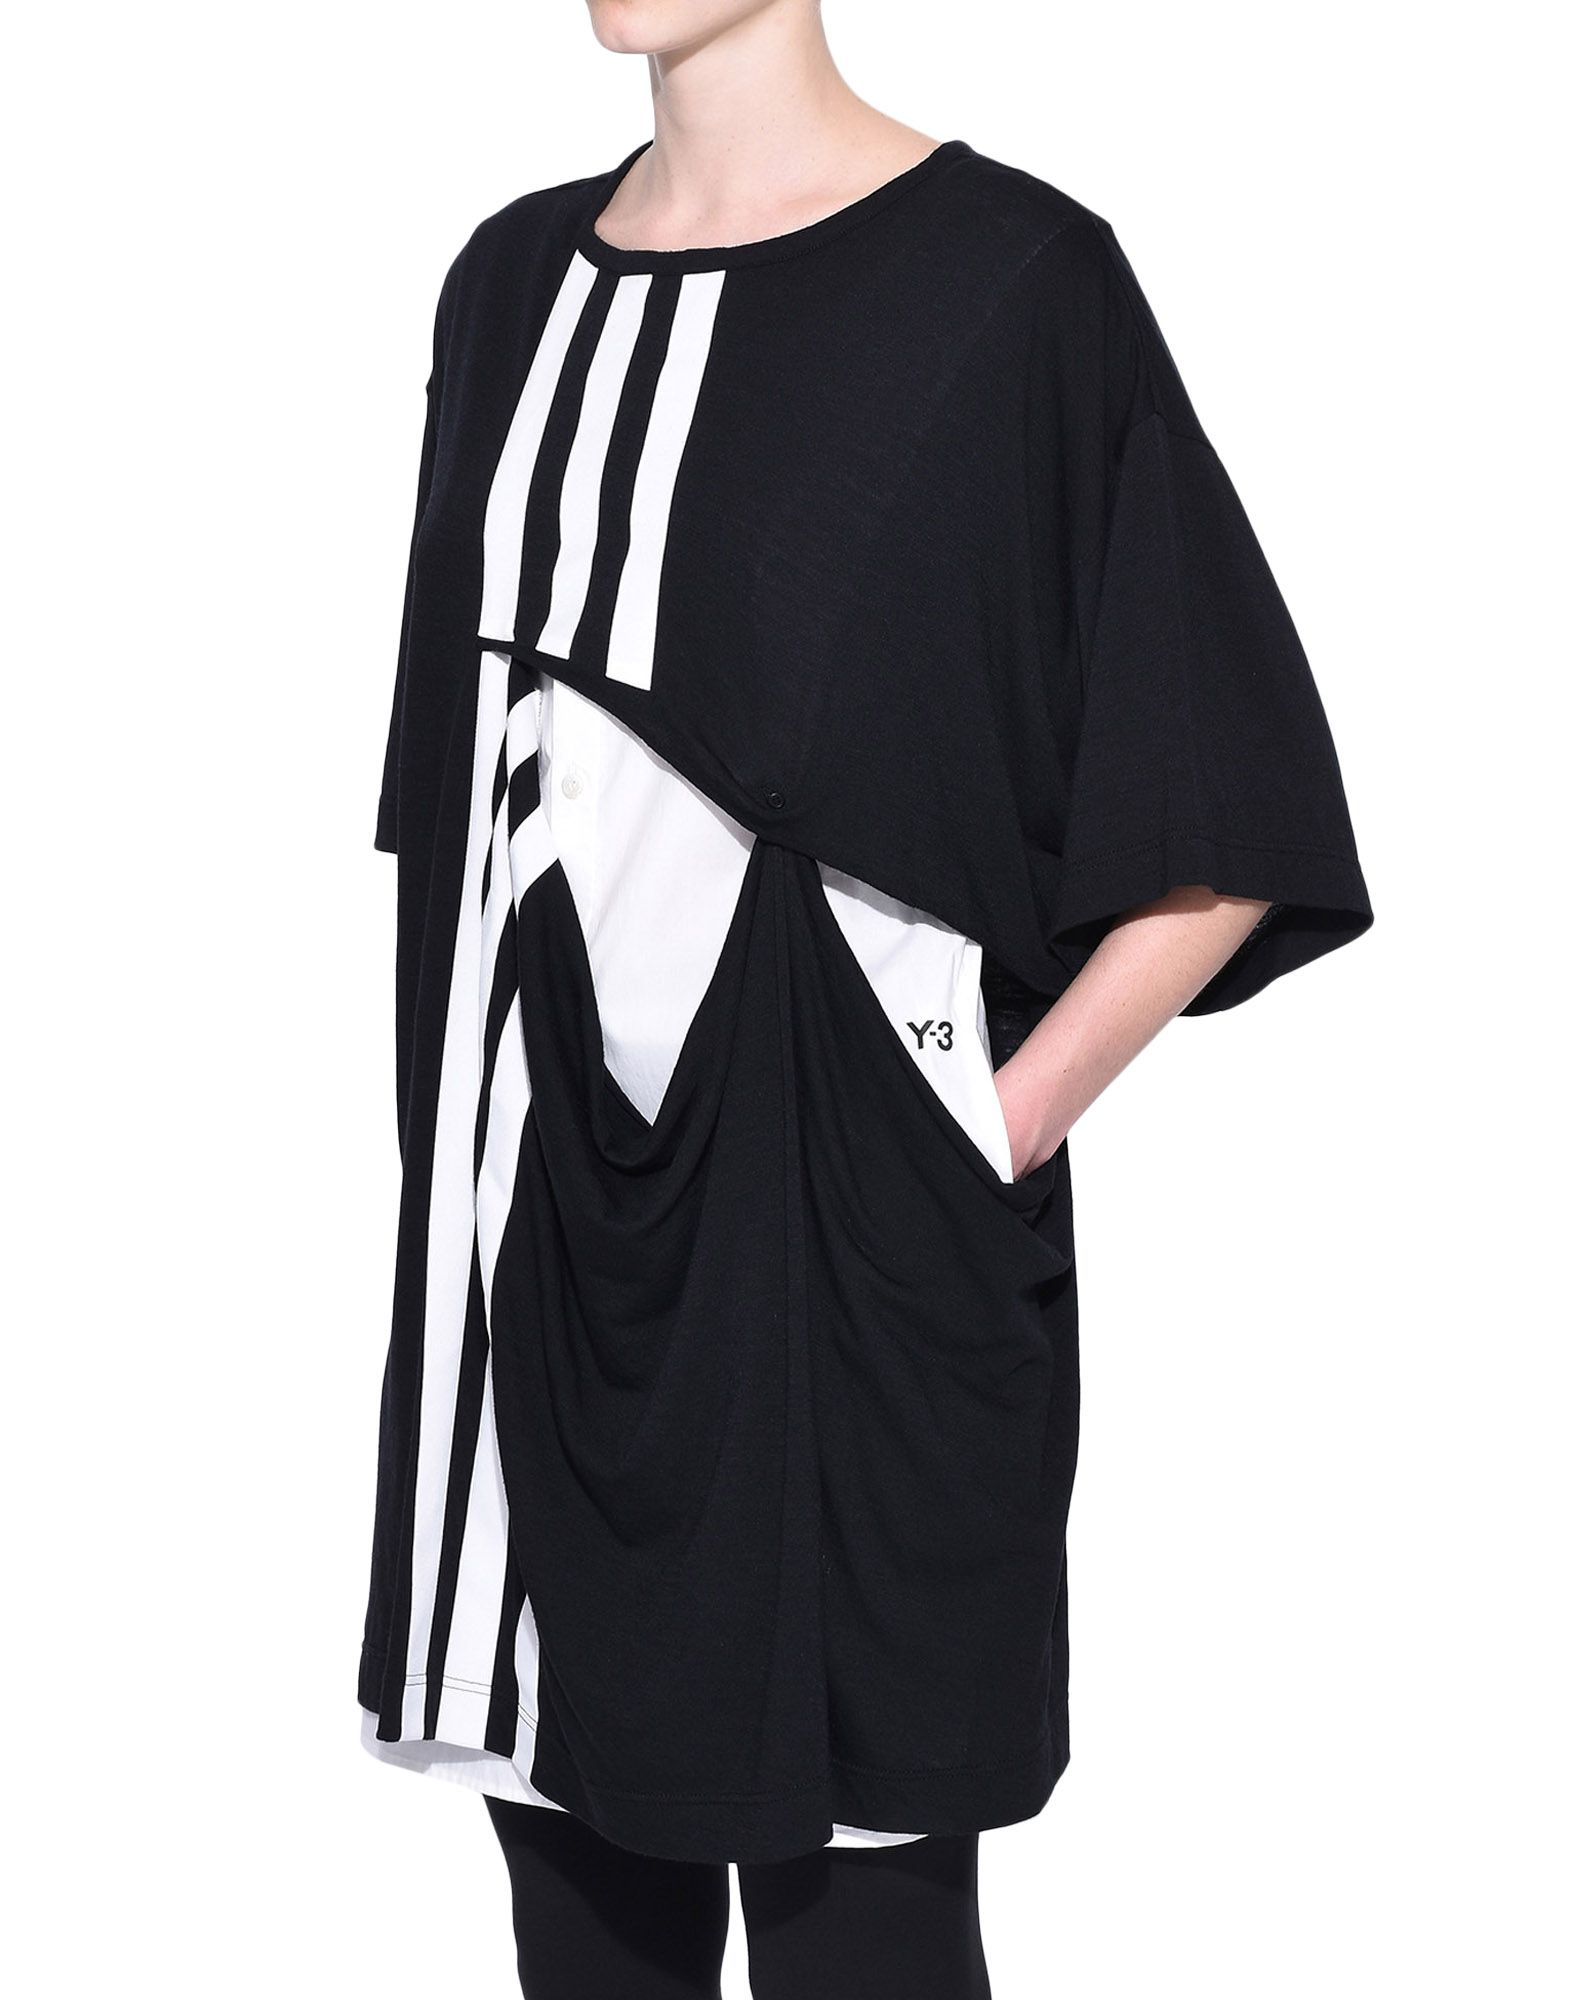 Y-3 Y-3 3-Stripes Layered Tee Short sleeve t-shirt Woman e